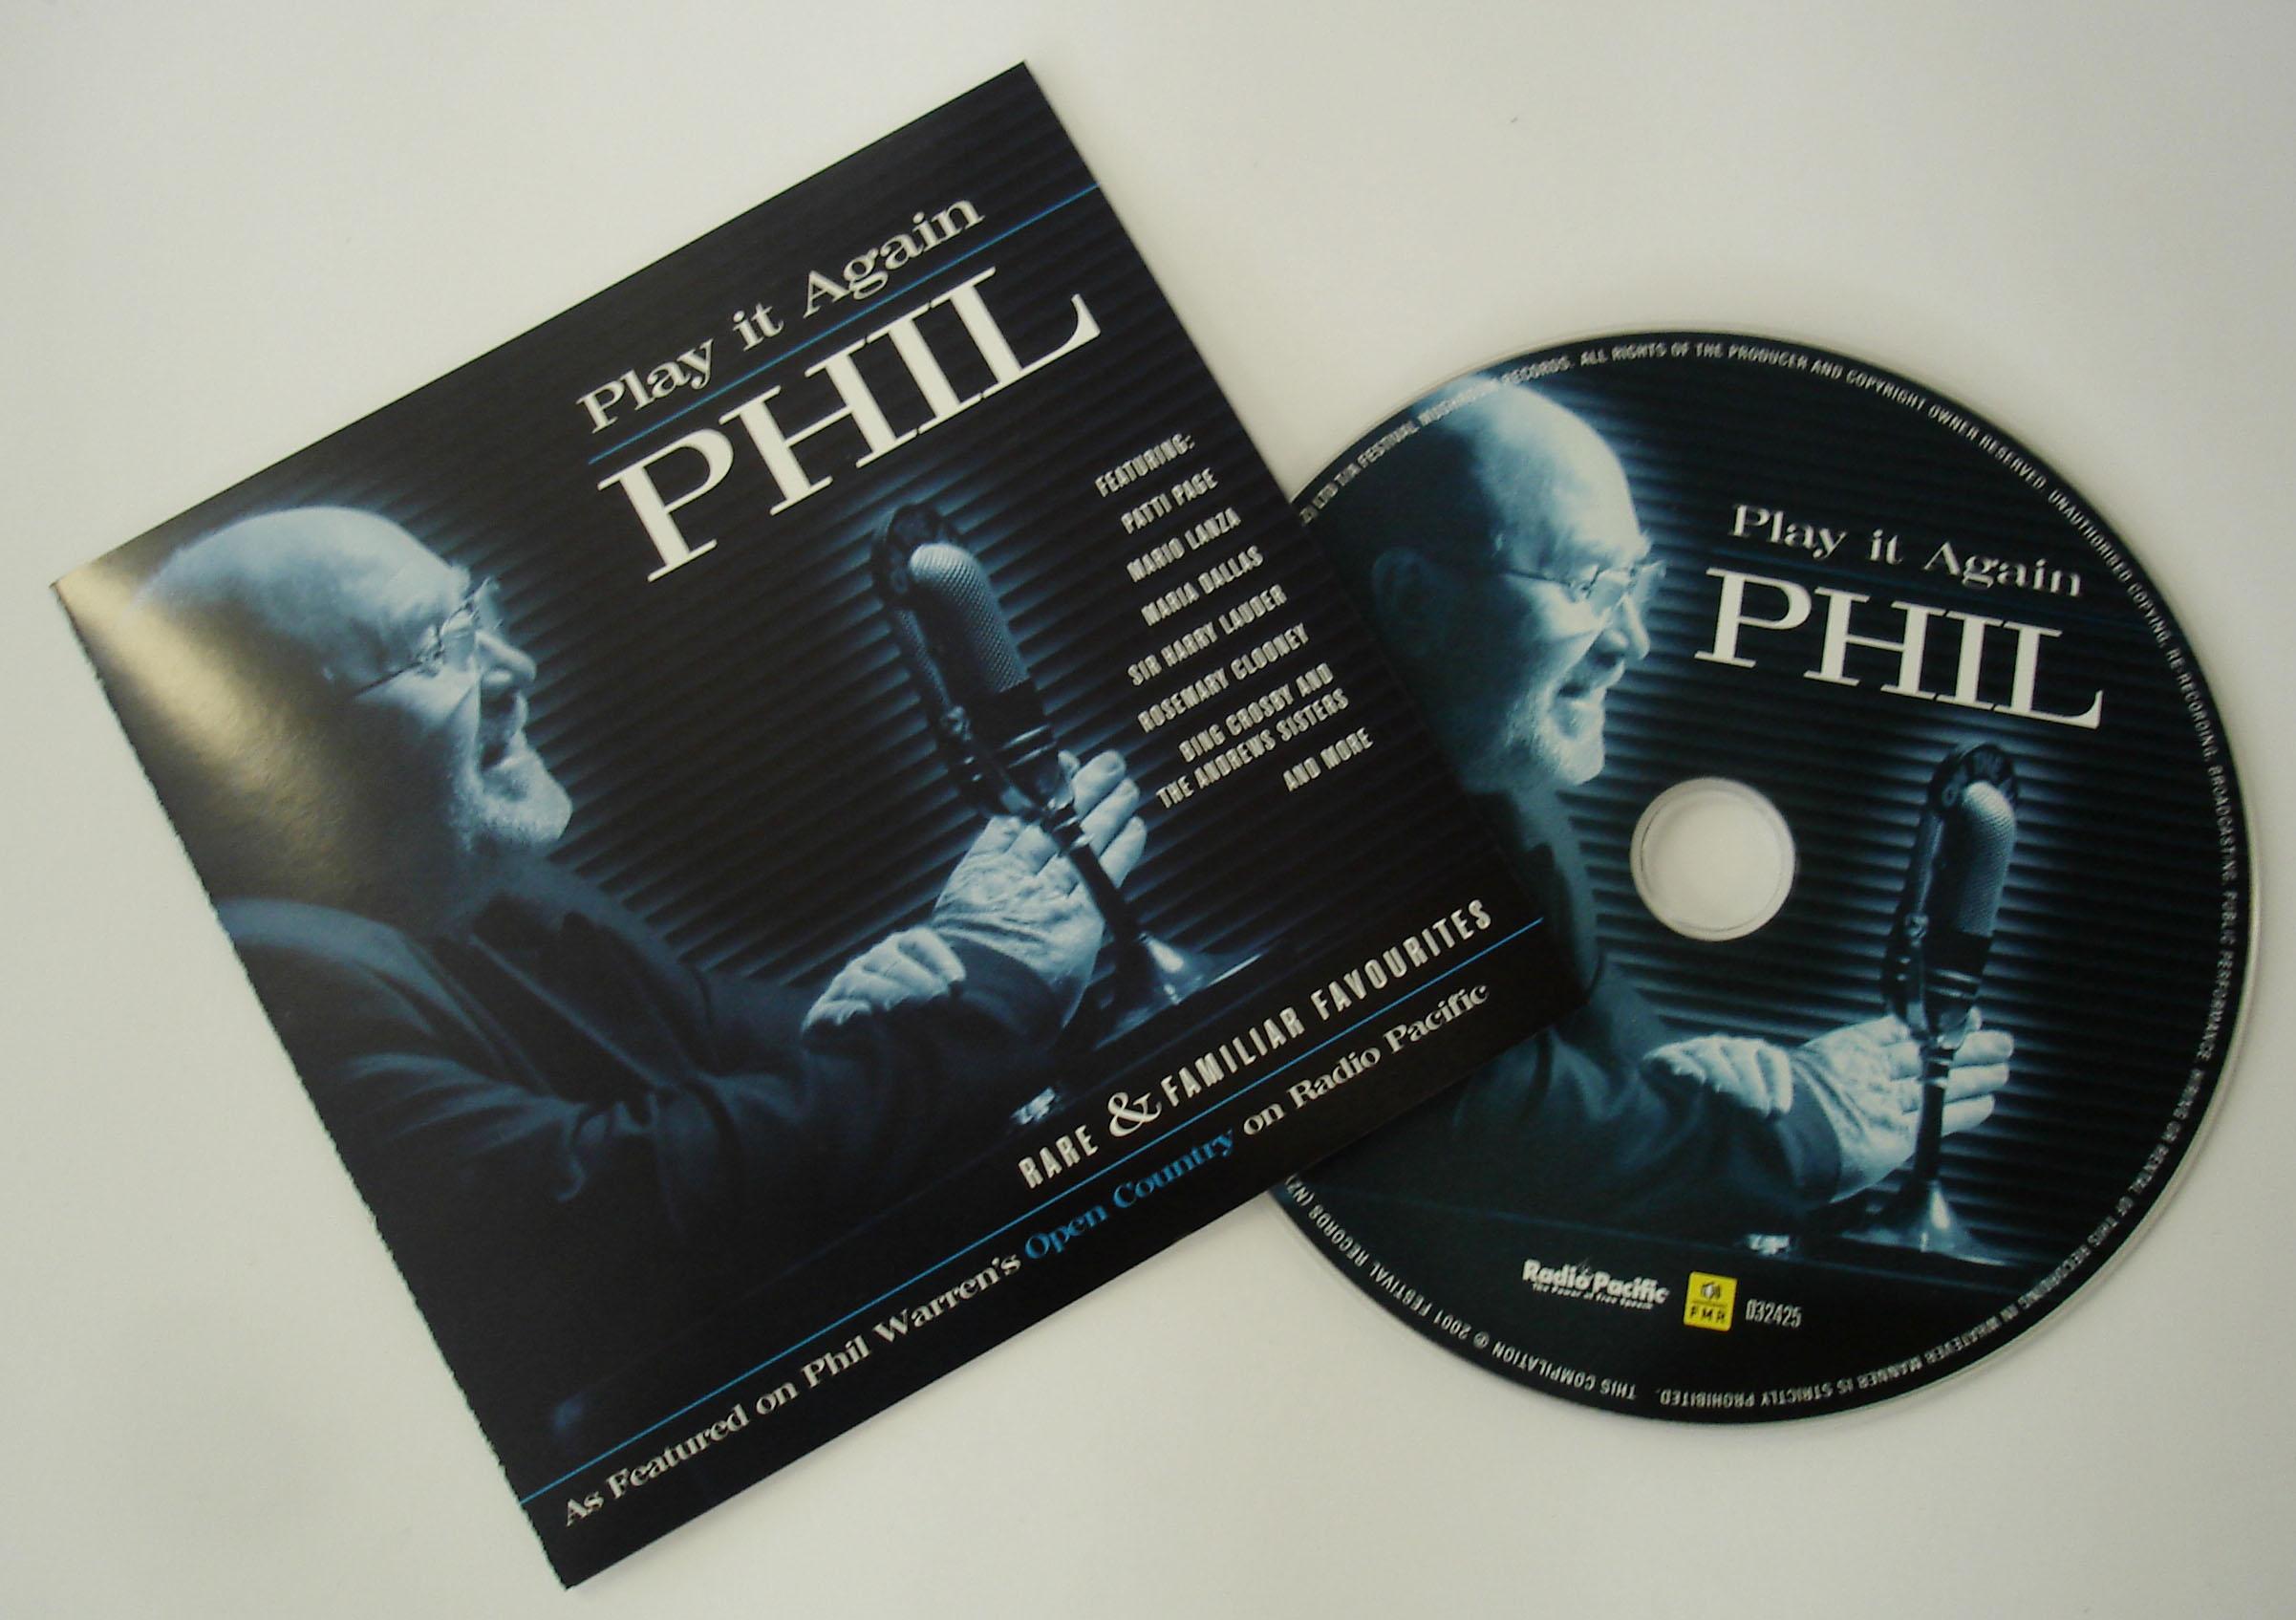 PLAY IT AGAIN PHIL